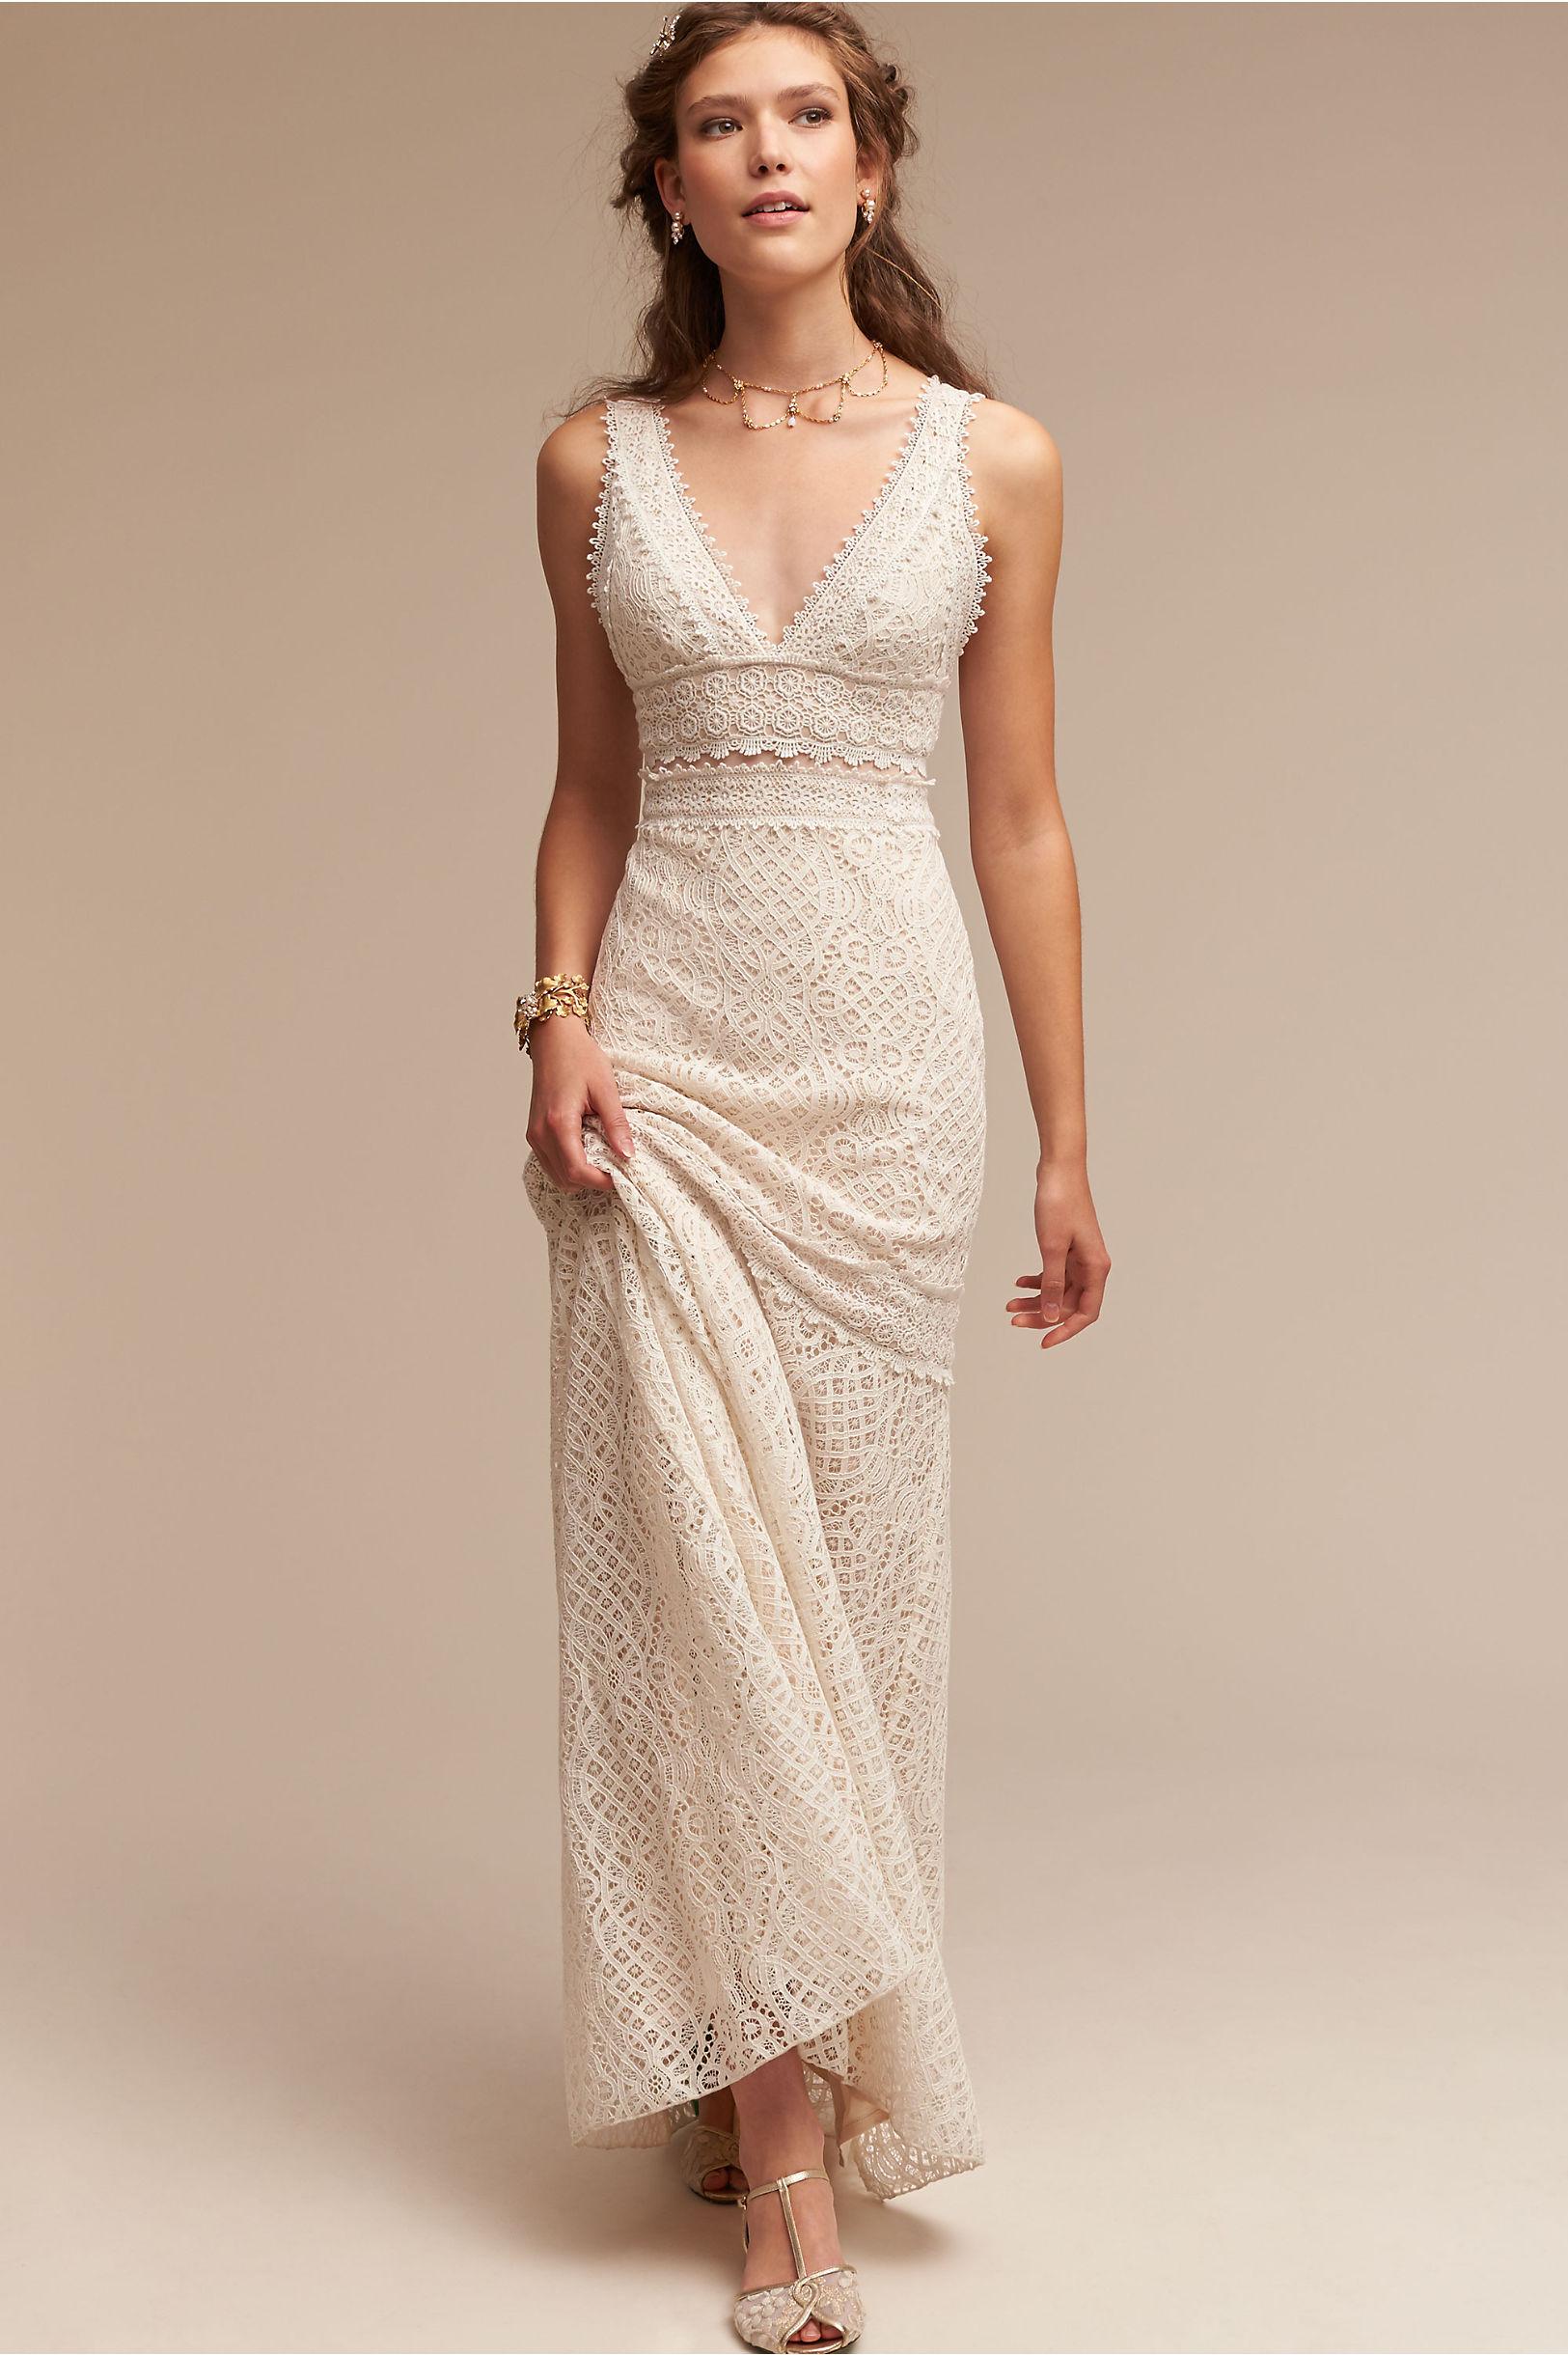 sale wedding dresses cheapest wedding dresses Kiely Gown